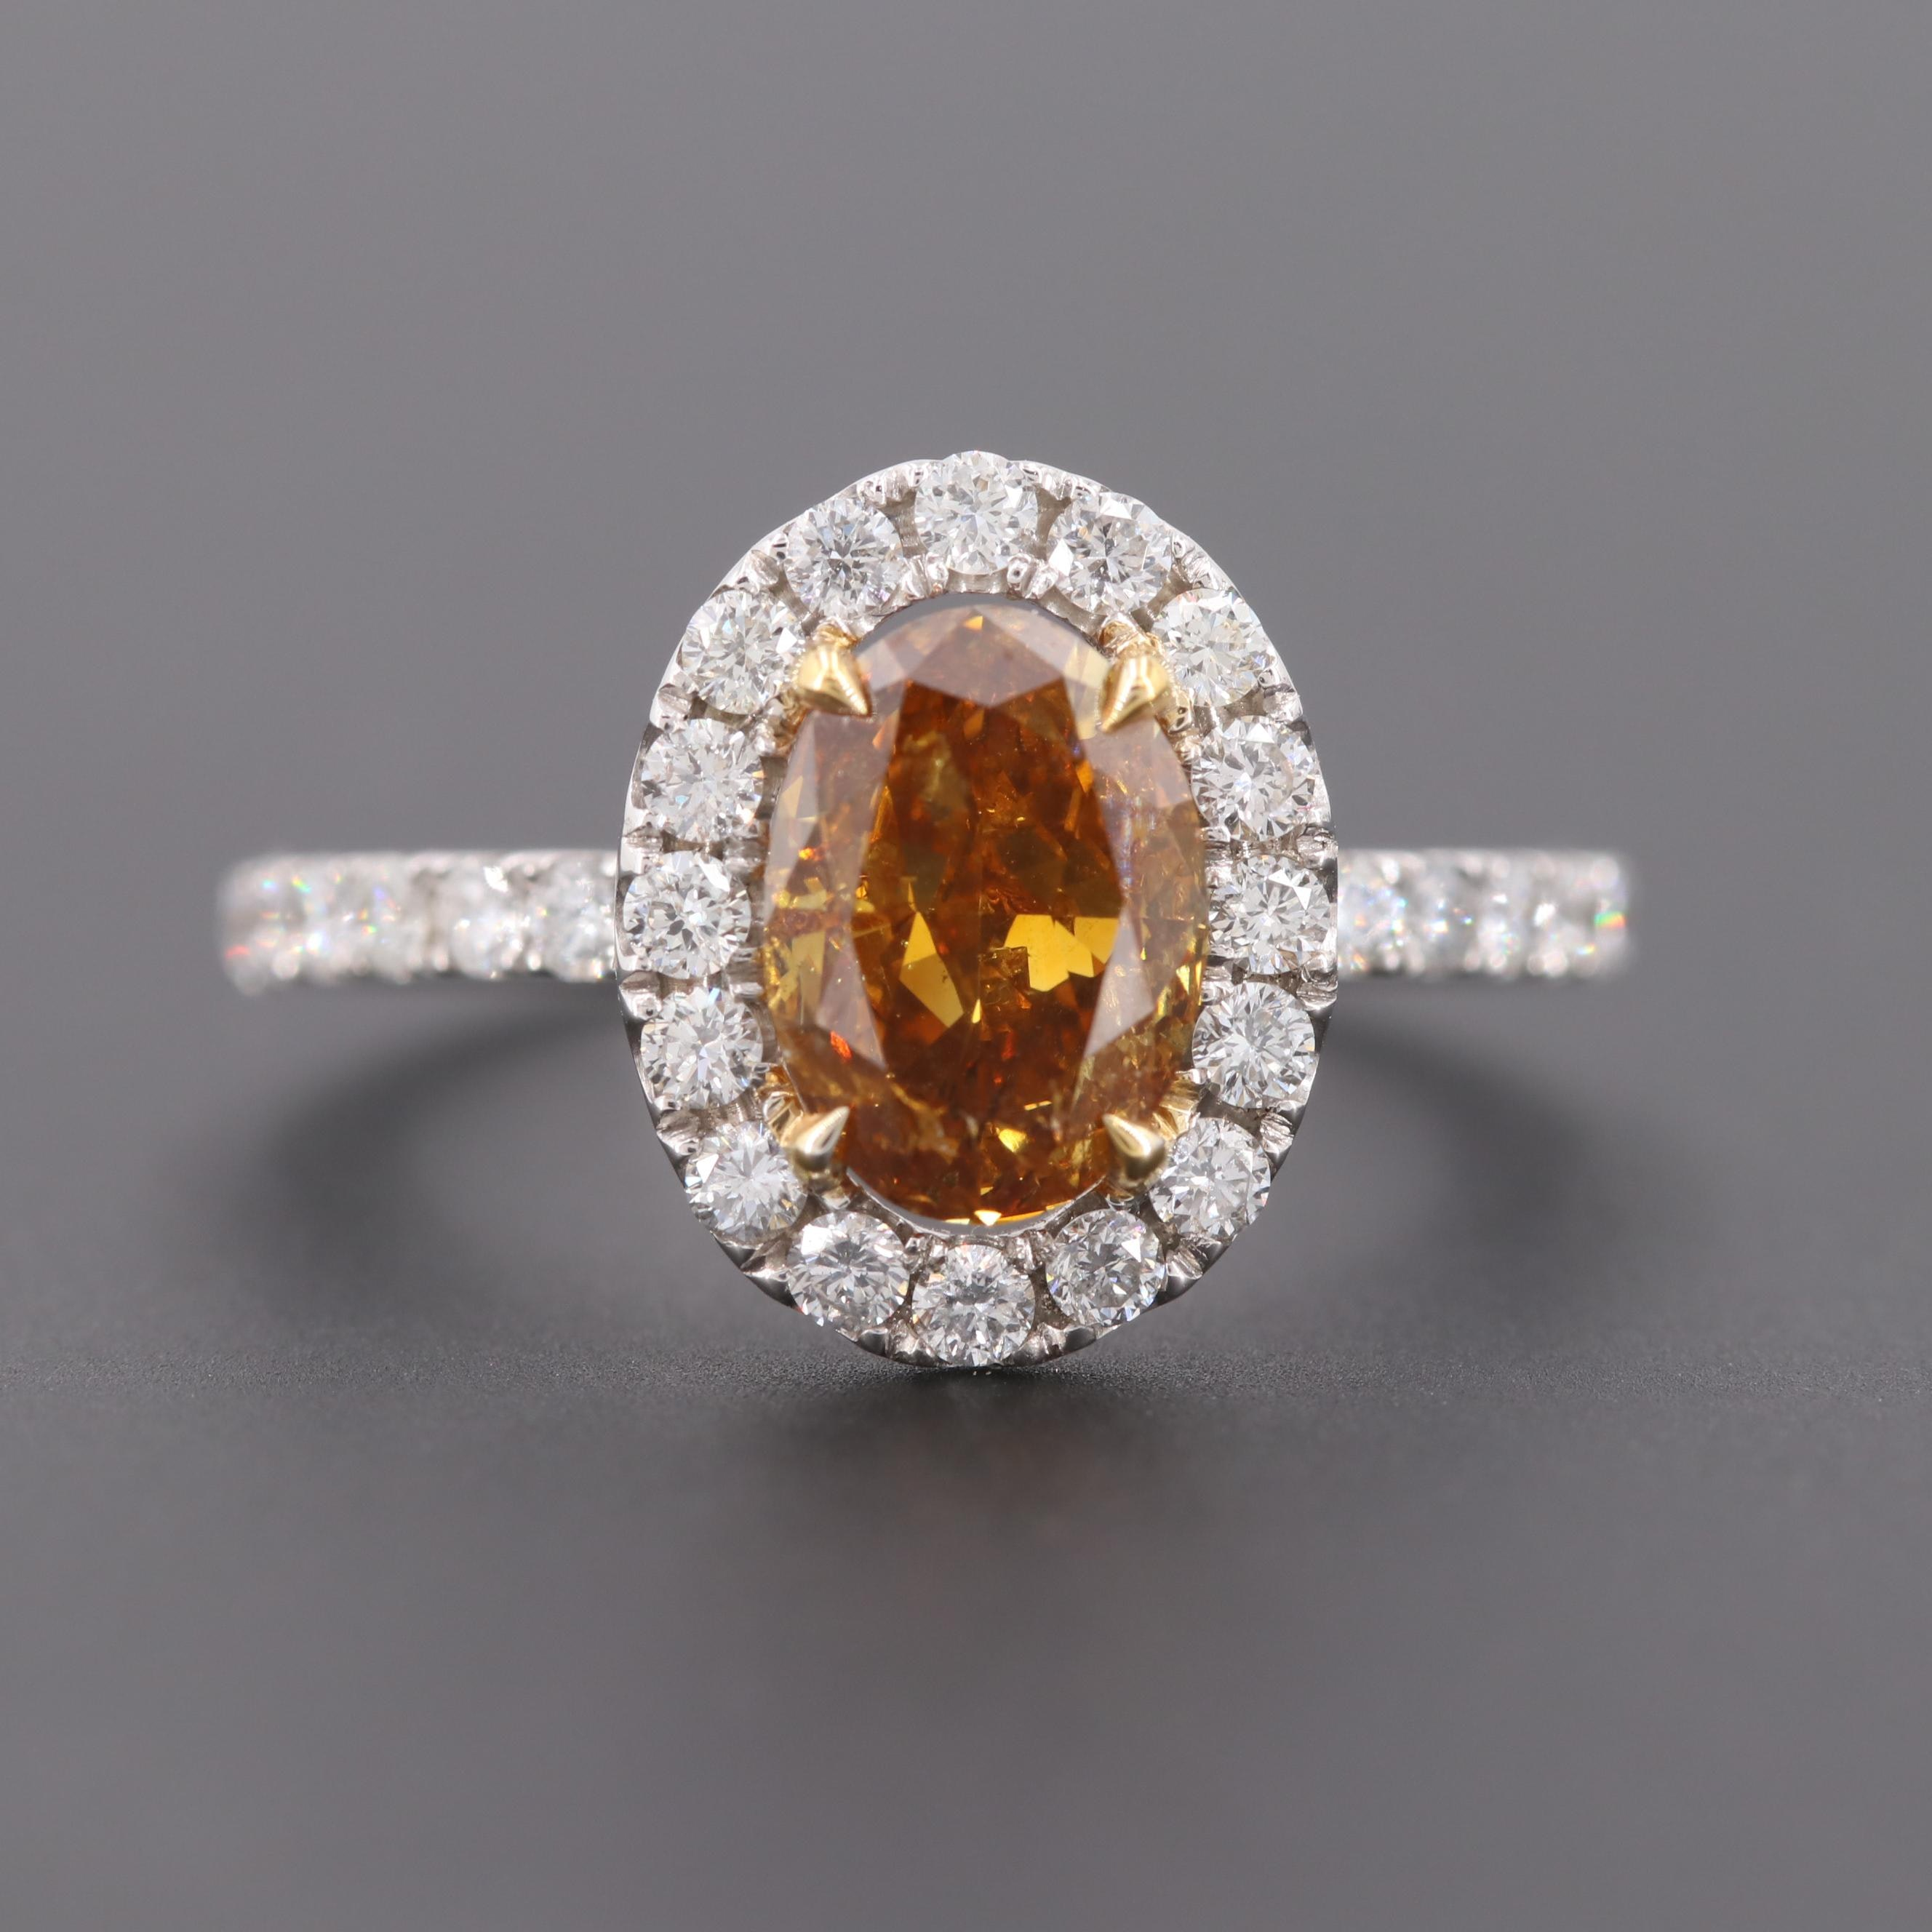 18K White Gold 2.11 CTW Fancy Orangey Yellow Diamond Ring with GIA Report